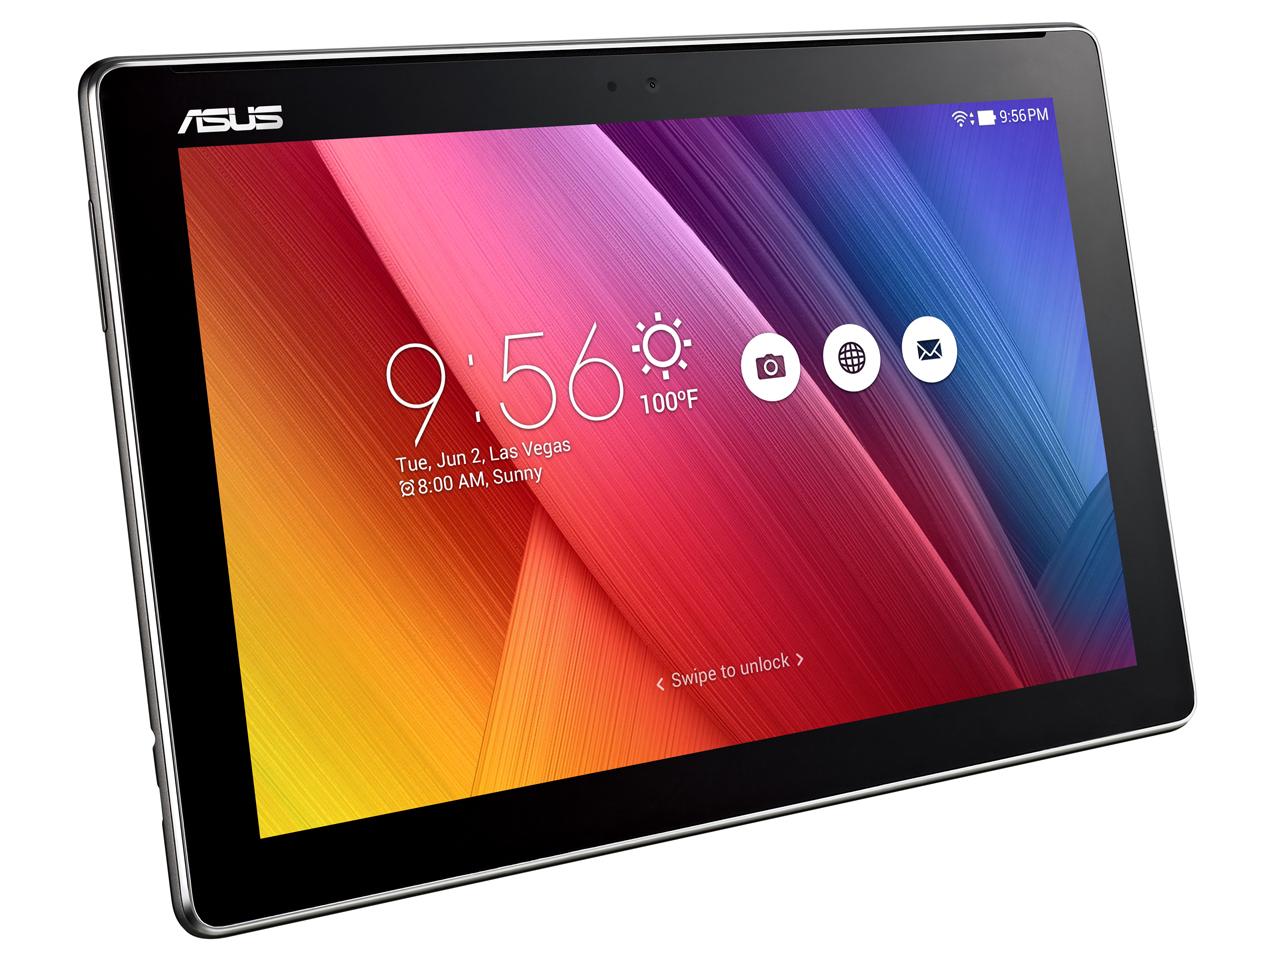 ASUS ZenPad 10 Z300M-BK16 [ブラック] の製品画像